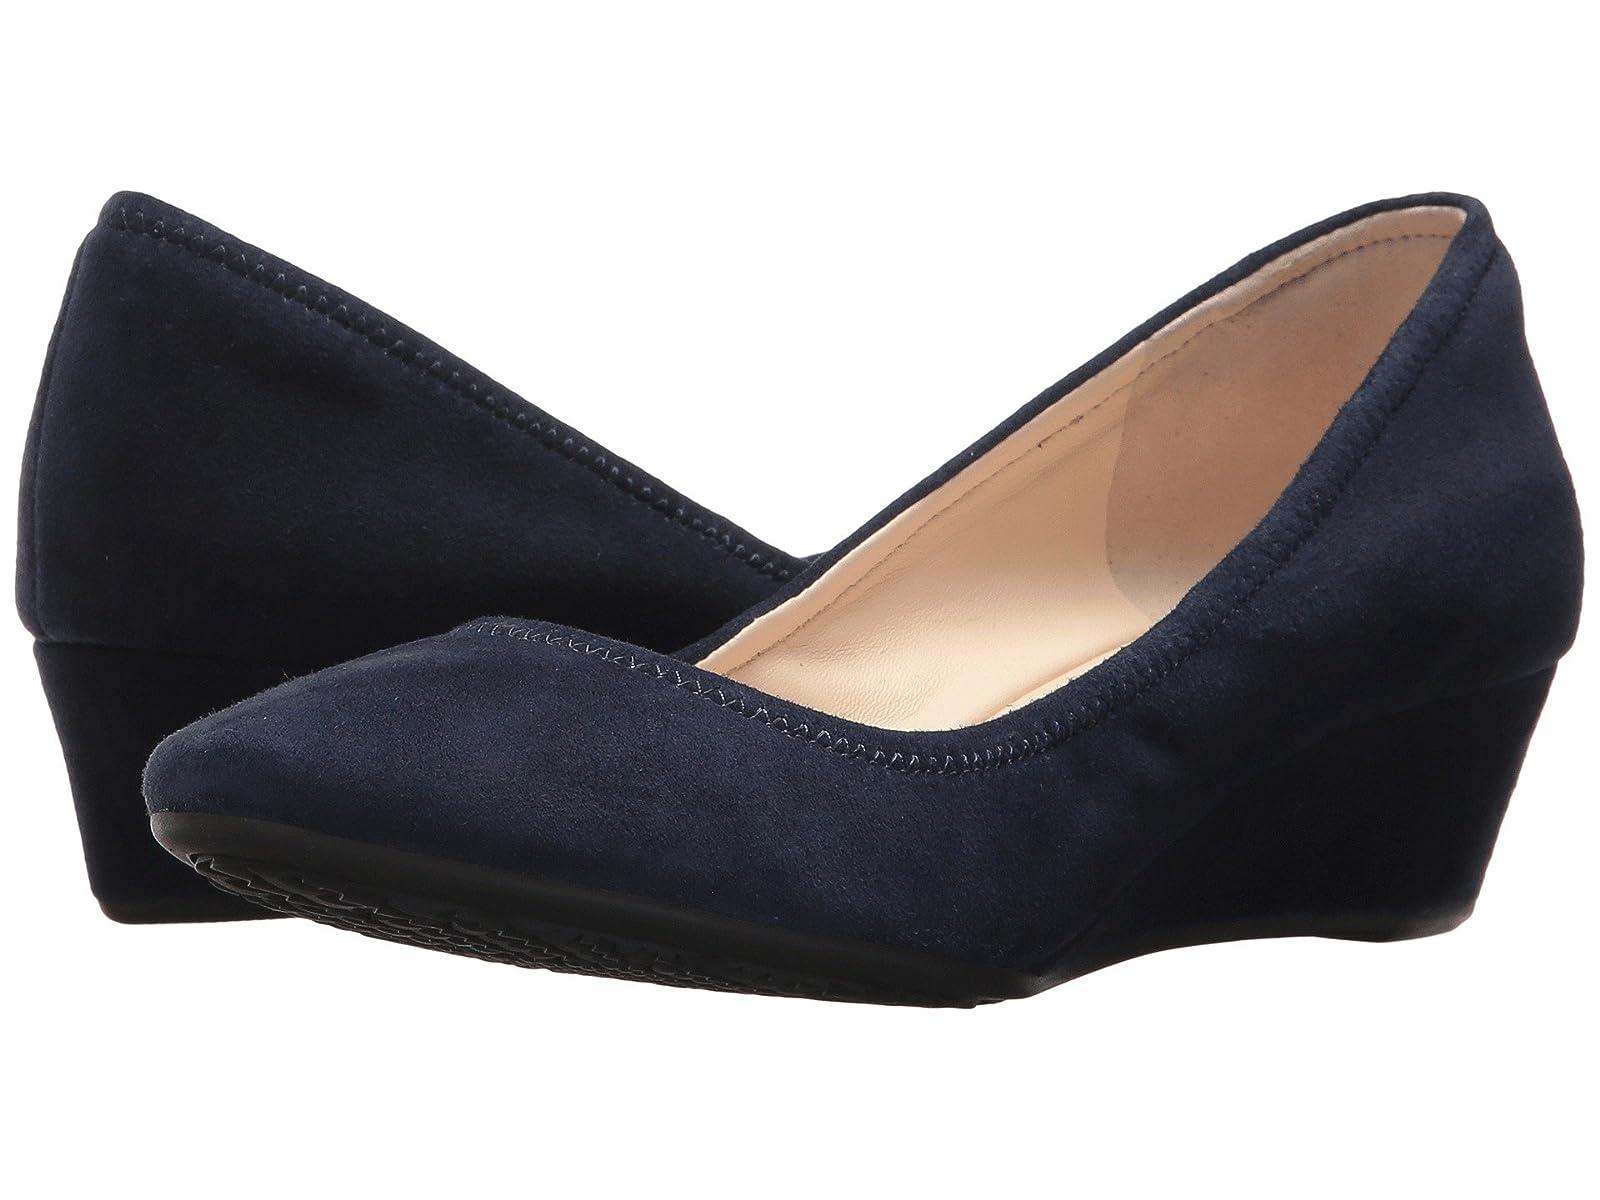 Cole Haan Sadie Wedge 40mmAtmospheric grades have affordable shoes